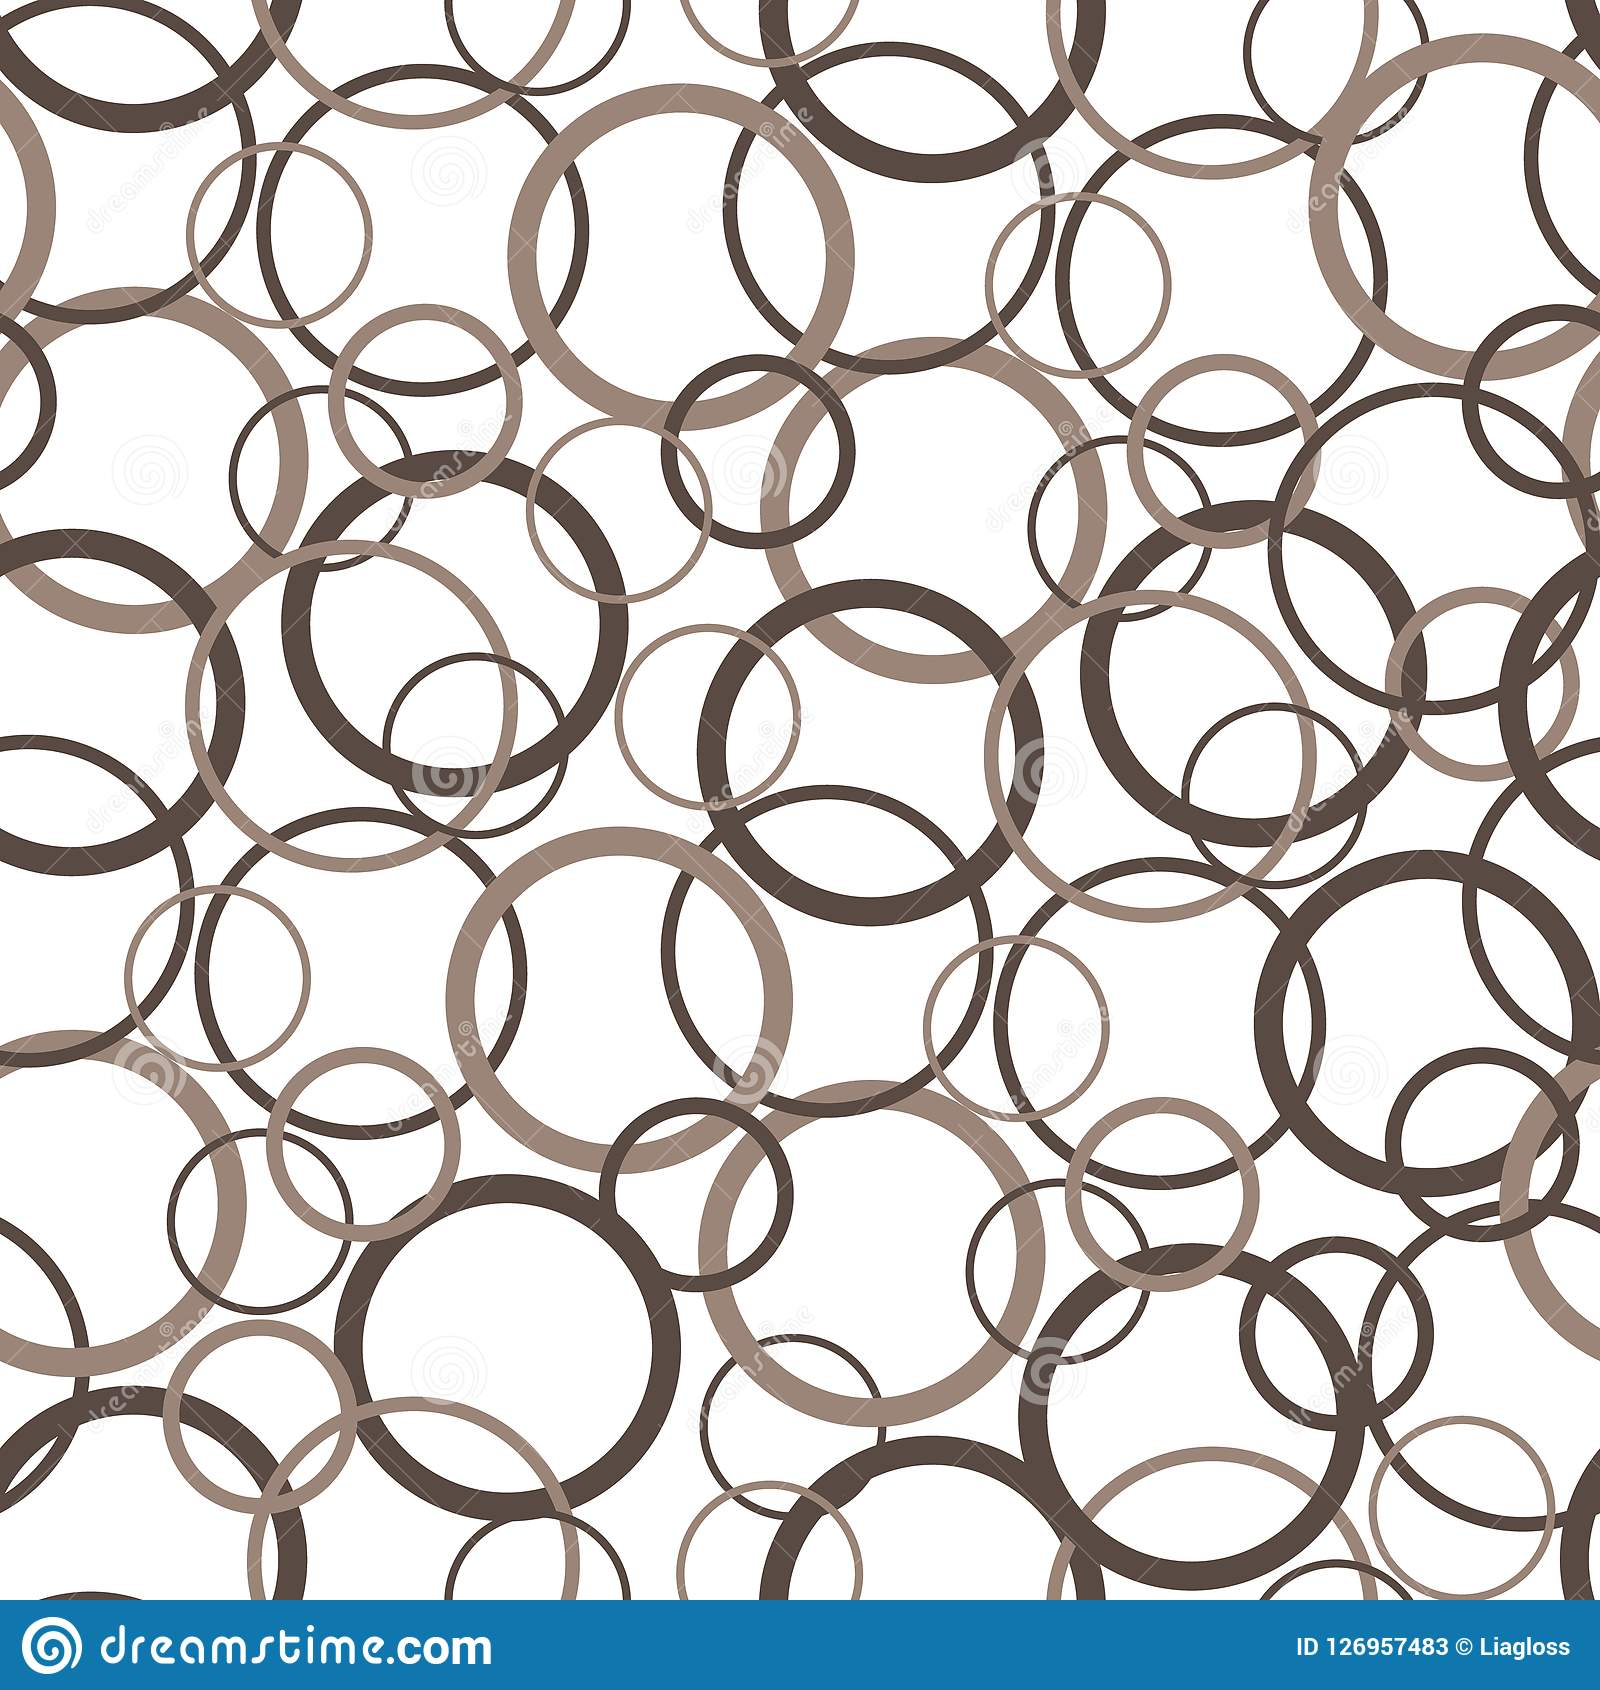 Geometric Circle Patterns Amazing Design Ideas